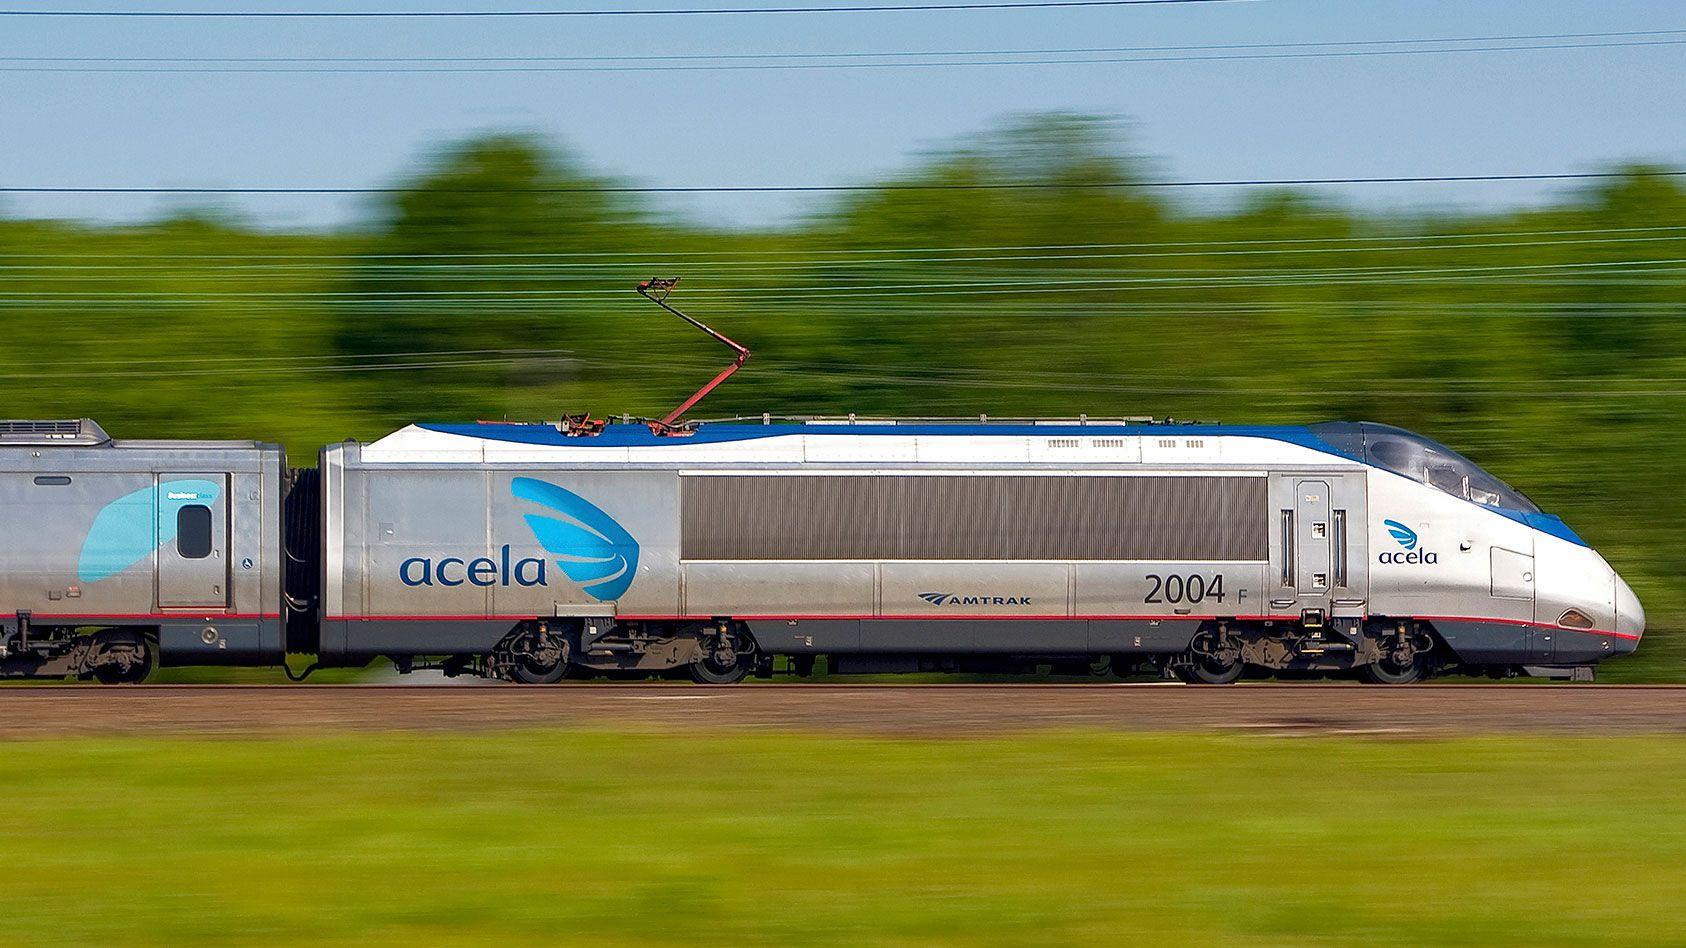 Acela Express Train Boston New Haven New York Philadelphia Baltimore Washington Dc Amtrak Acela Amtrak Train